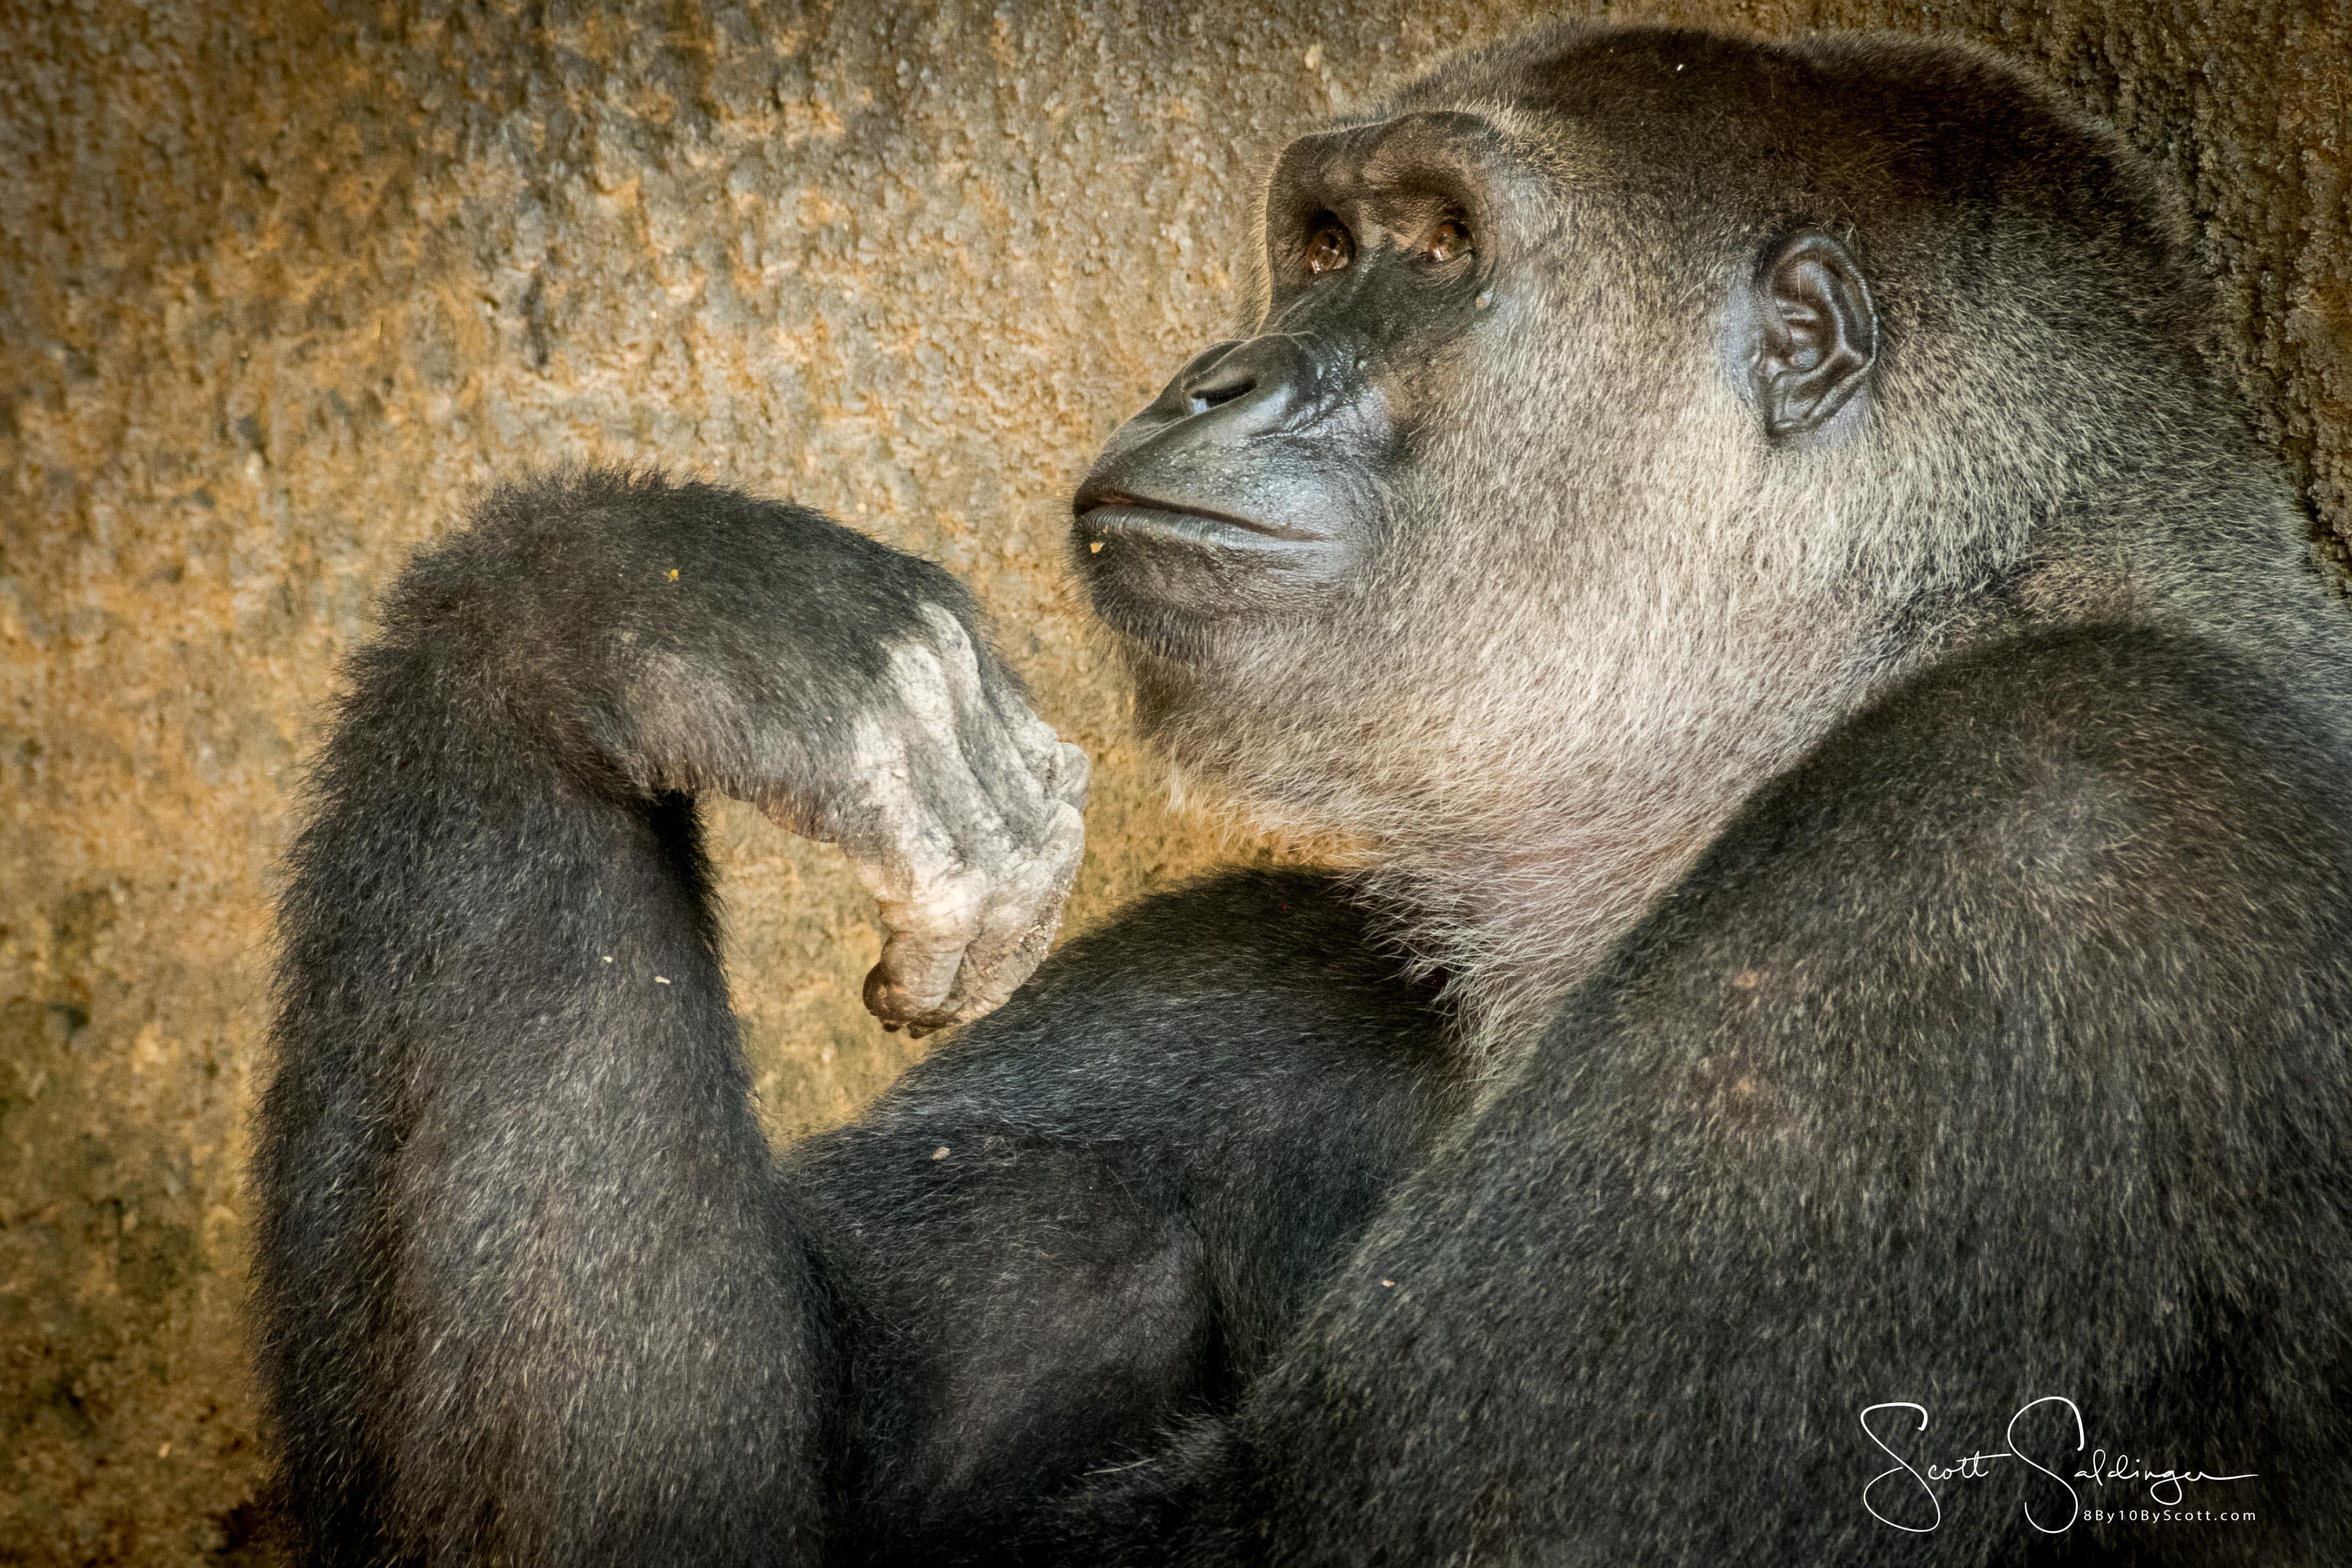 Apes-5763